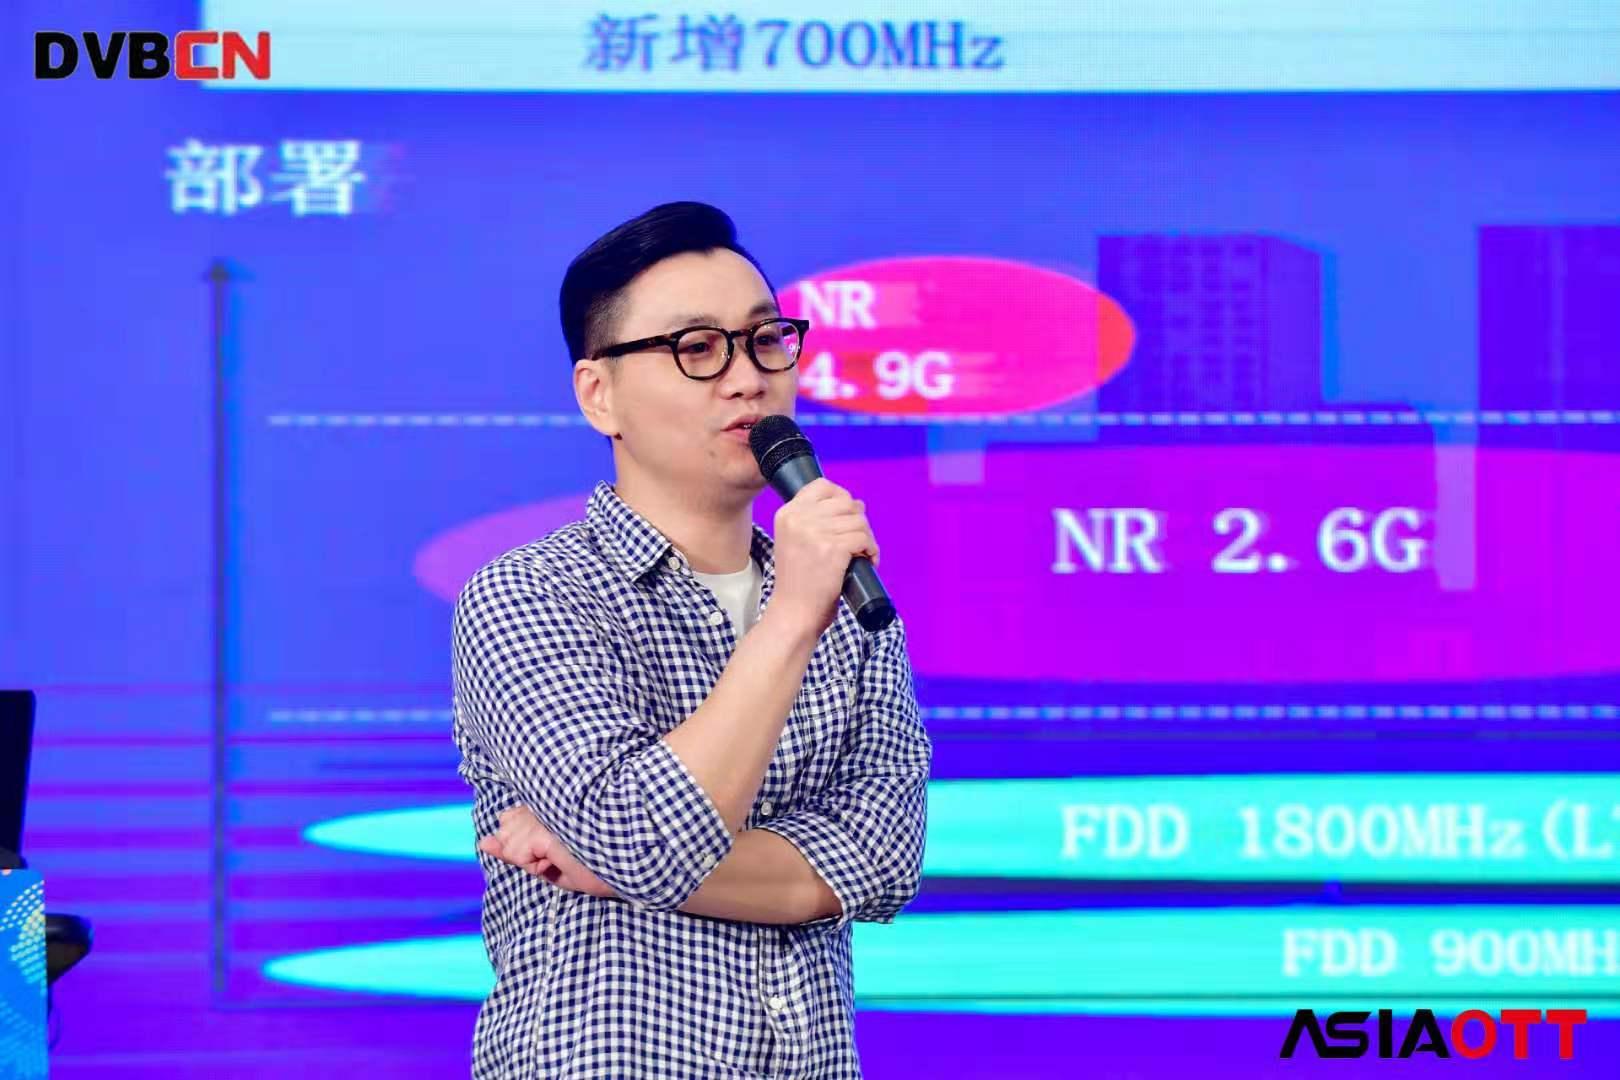 【BIRTV2019】果通科技创始人兼CEO施成斌:在未来5年内eMBB业务仍将主导5G的服务收入